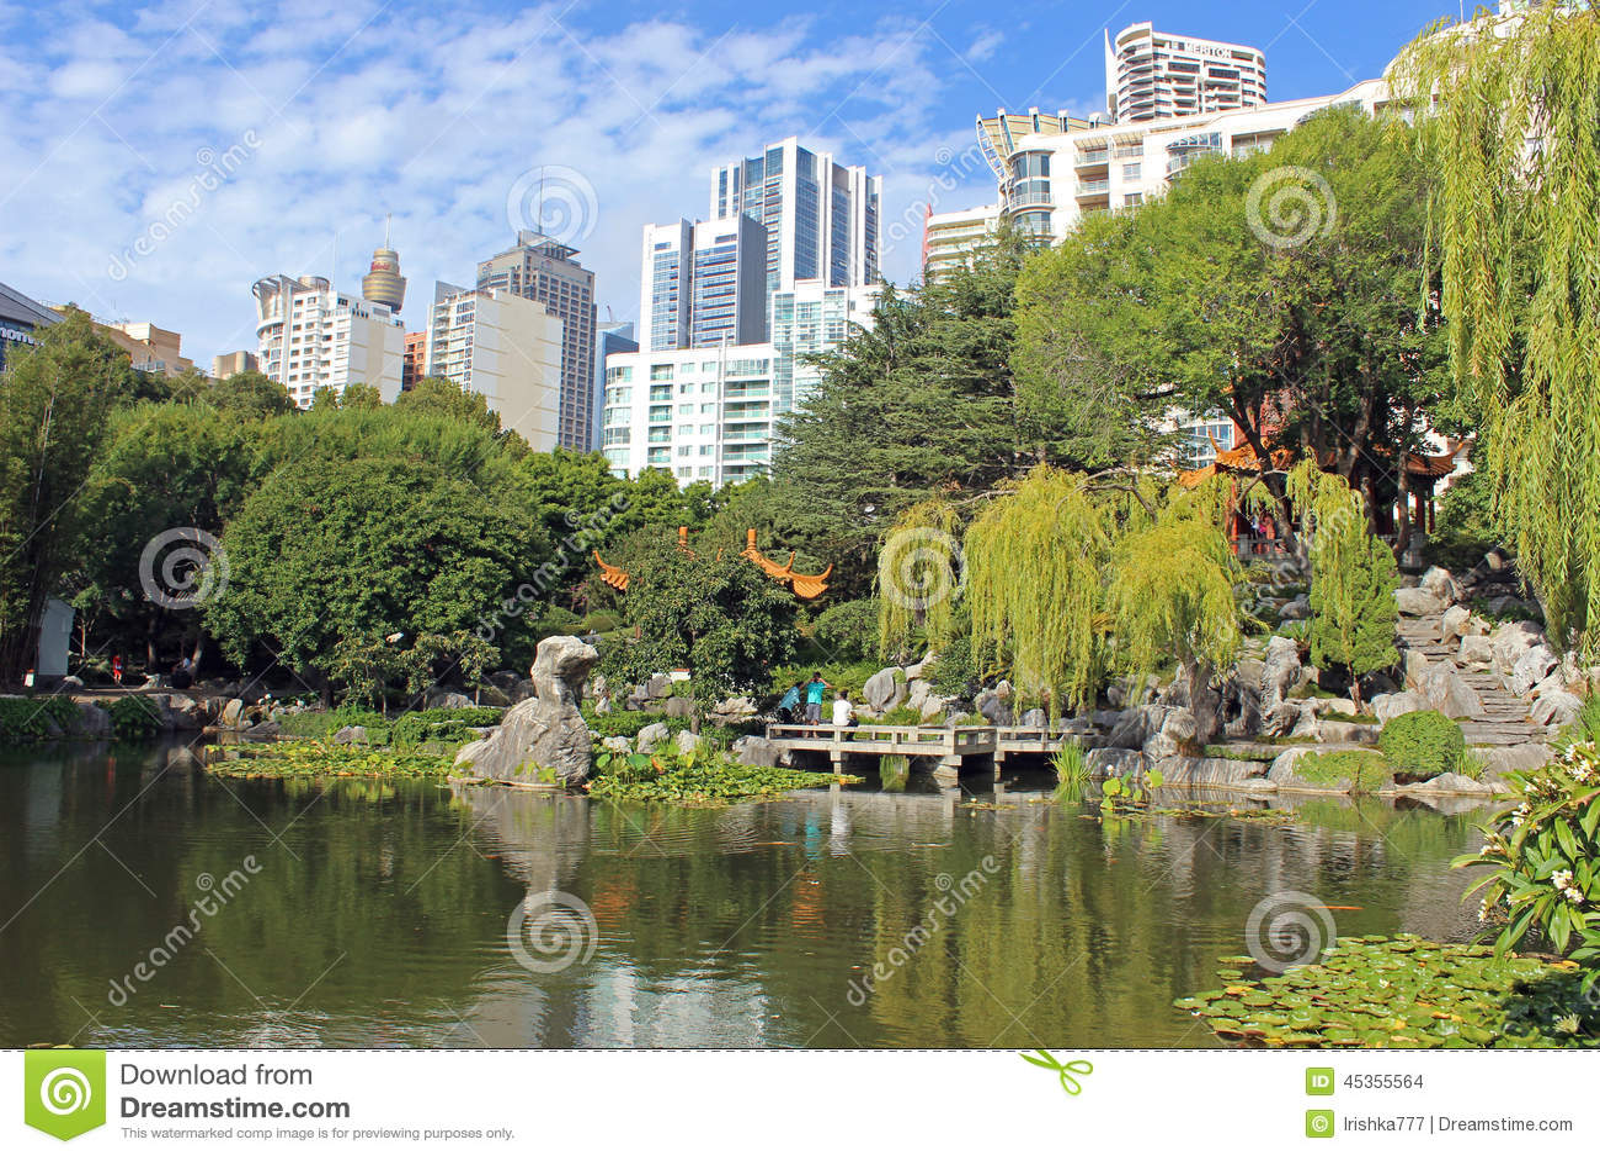 Jardin japonais sydney australie image stock ditorial for Jardin pittoresque